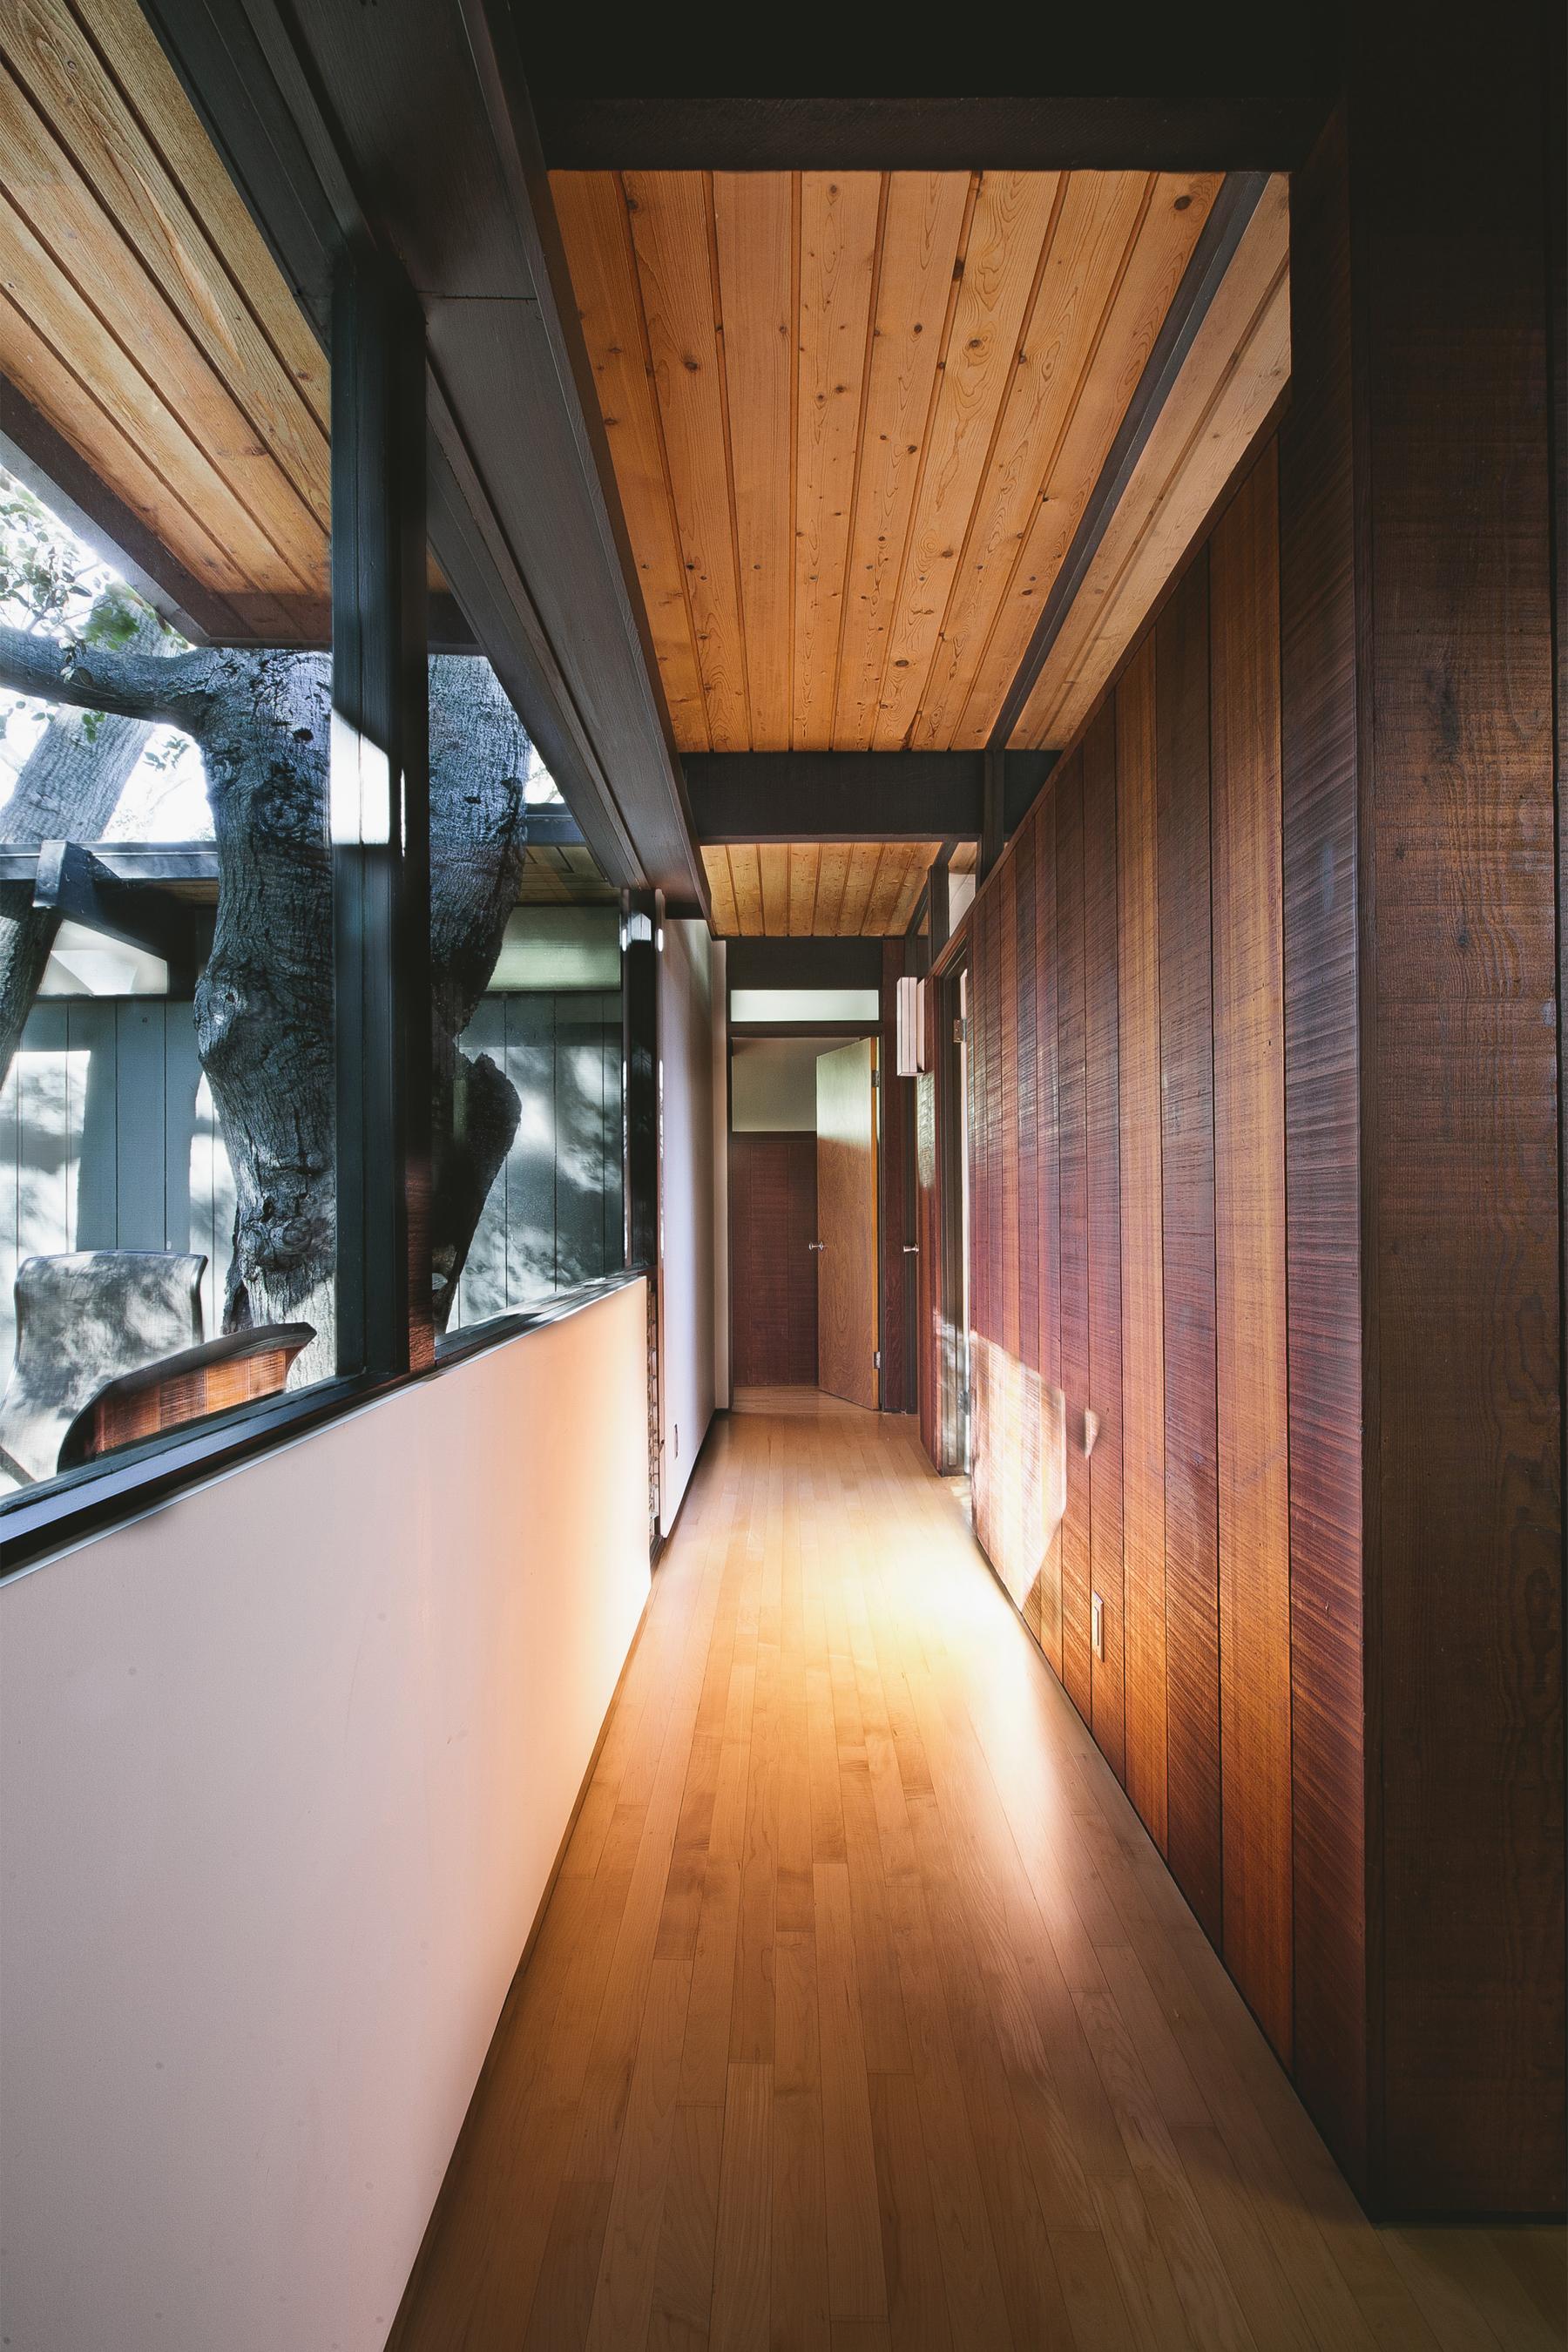 S.E.A.-Studio-Environmental-Architecture-David-Hertz-FAIA-Doug-Rucker-Cold-Creek-Malibu-historic-preservation-sustainable-regenerative-restorative-design-remodel-midcentury-modern-post-beam-residential-contemporary-addition-Santa-Monica-mountains-2.jpg